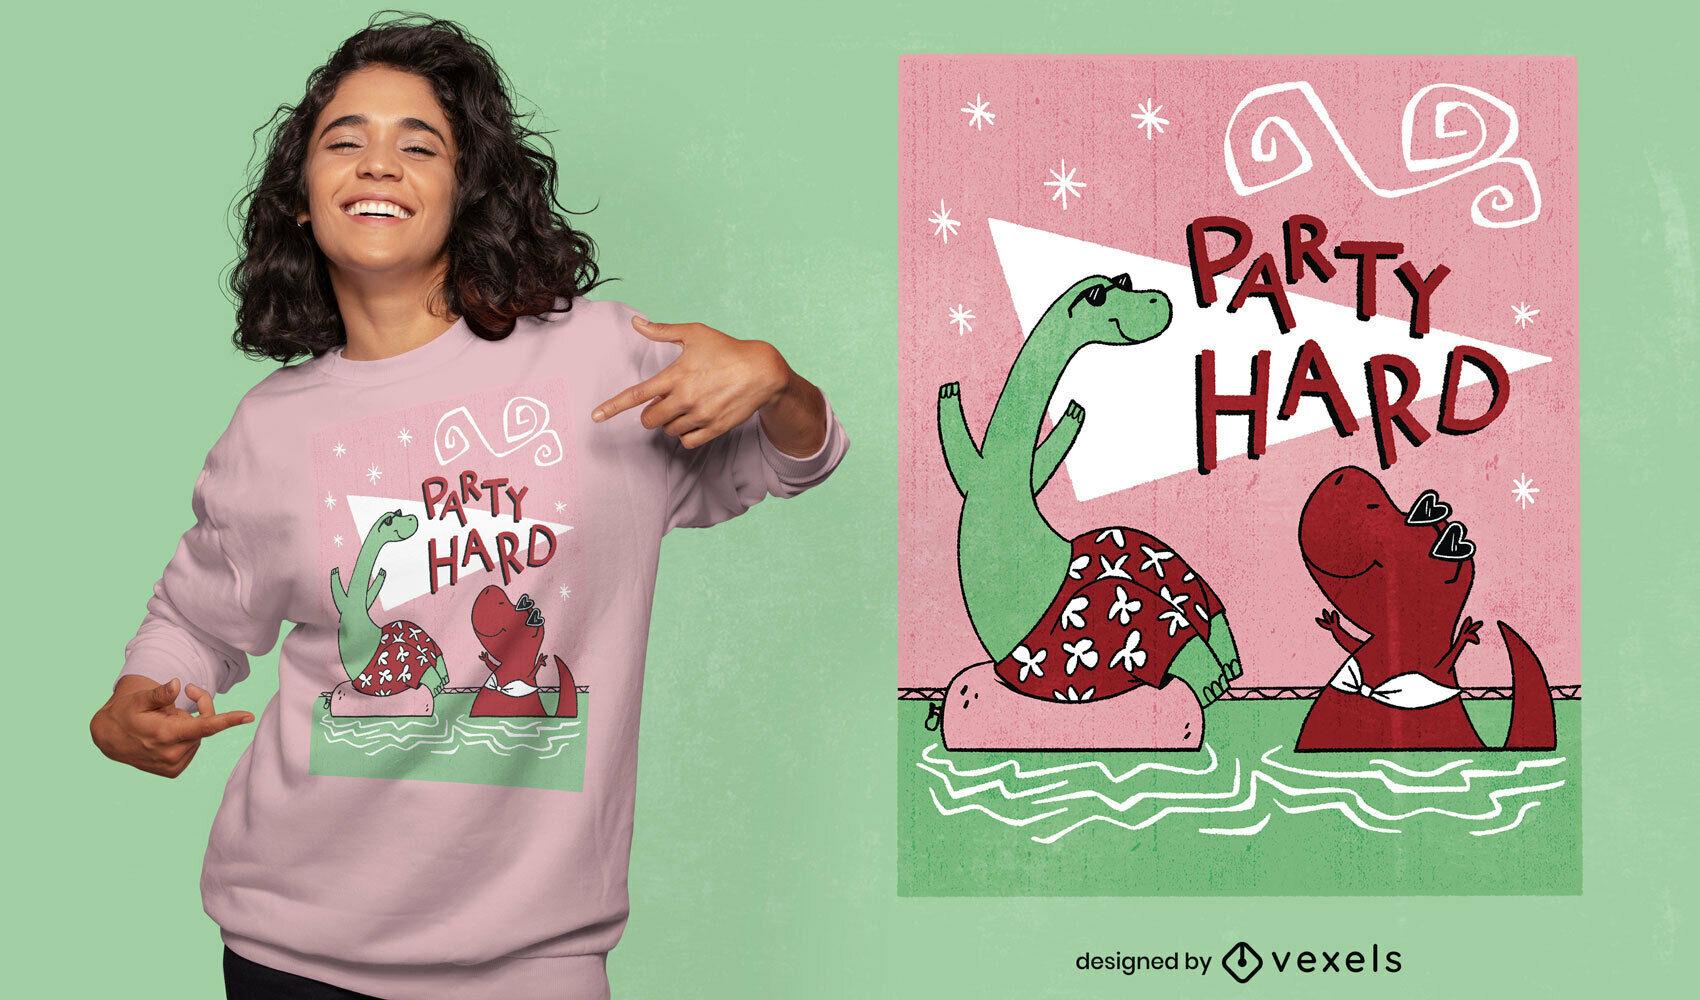 Party hard dinosaurs psd t-shirt design